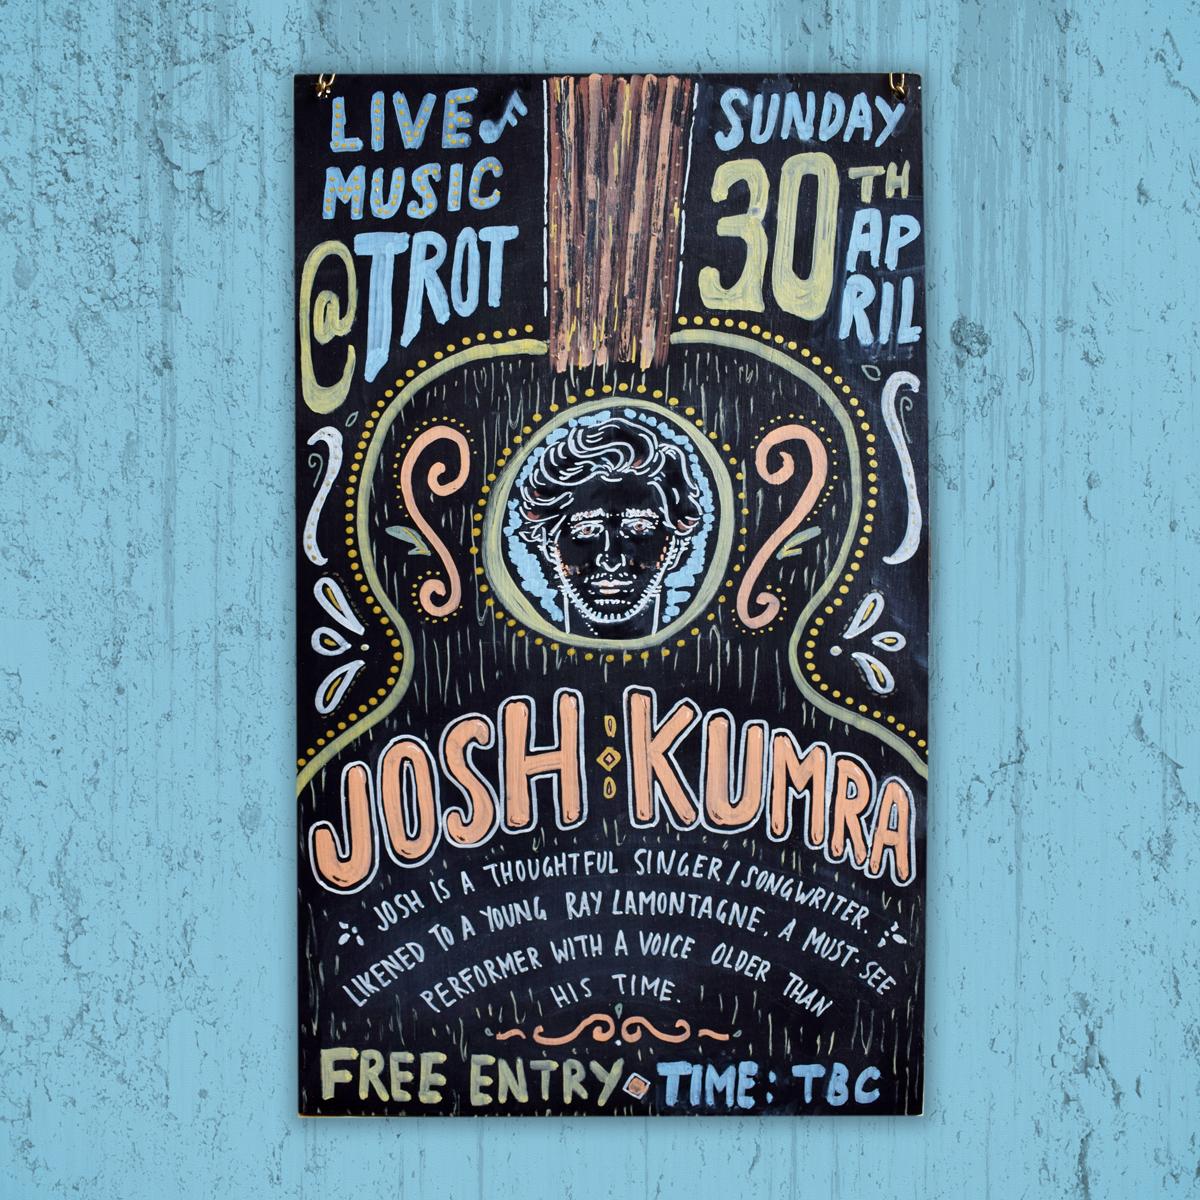 Josh-Kumra-chalkboard.jpg